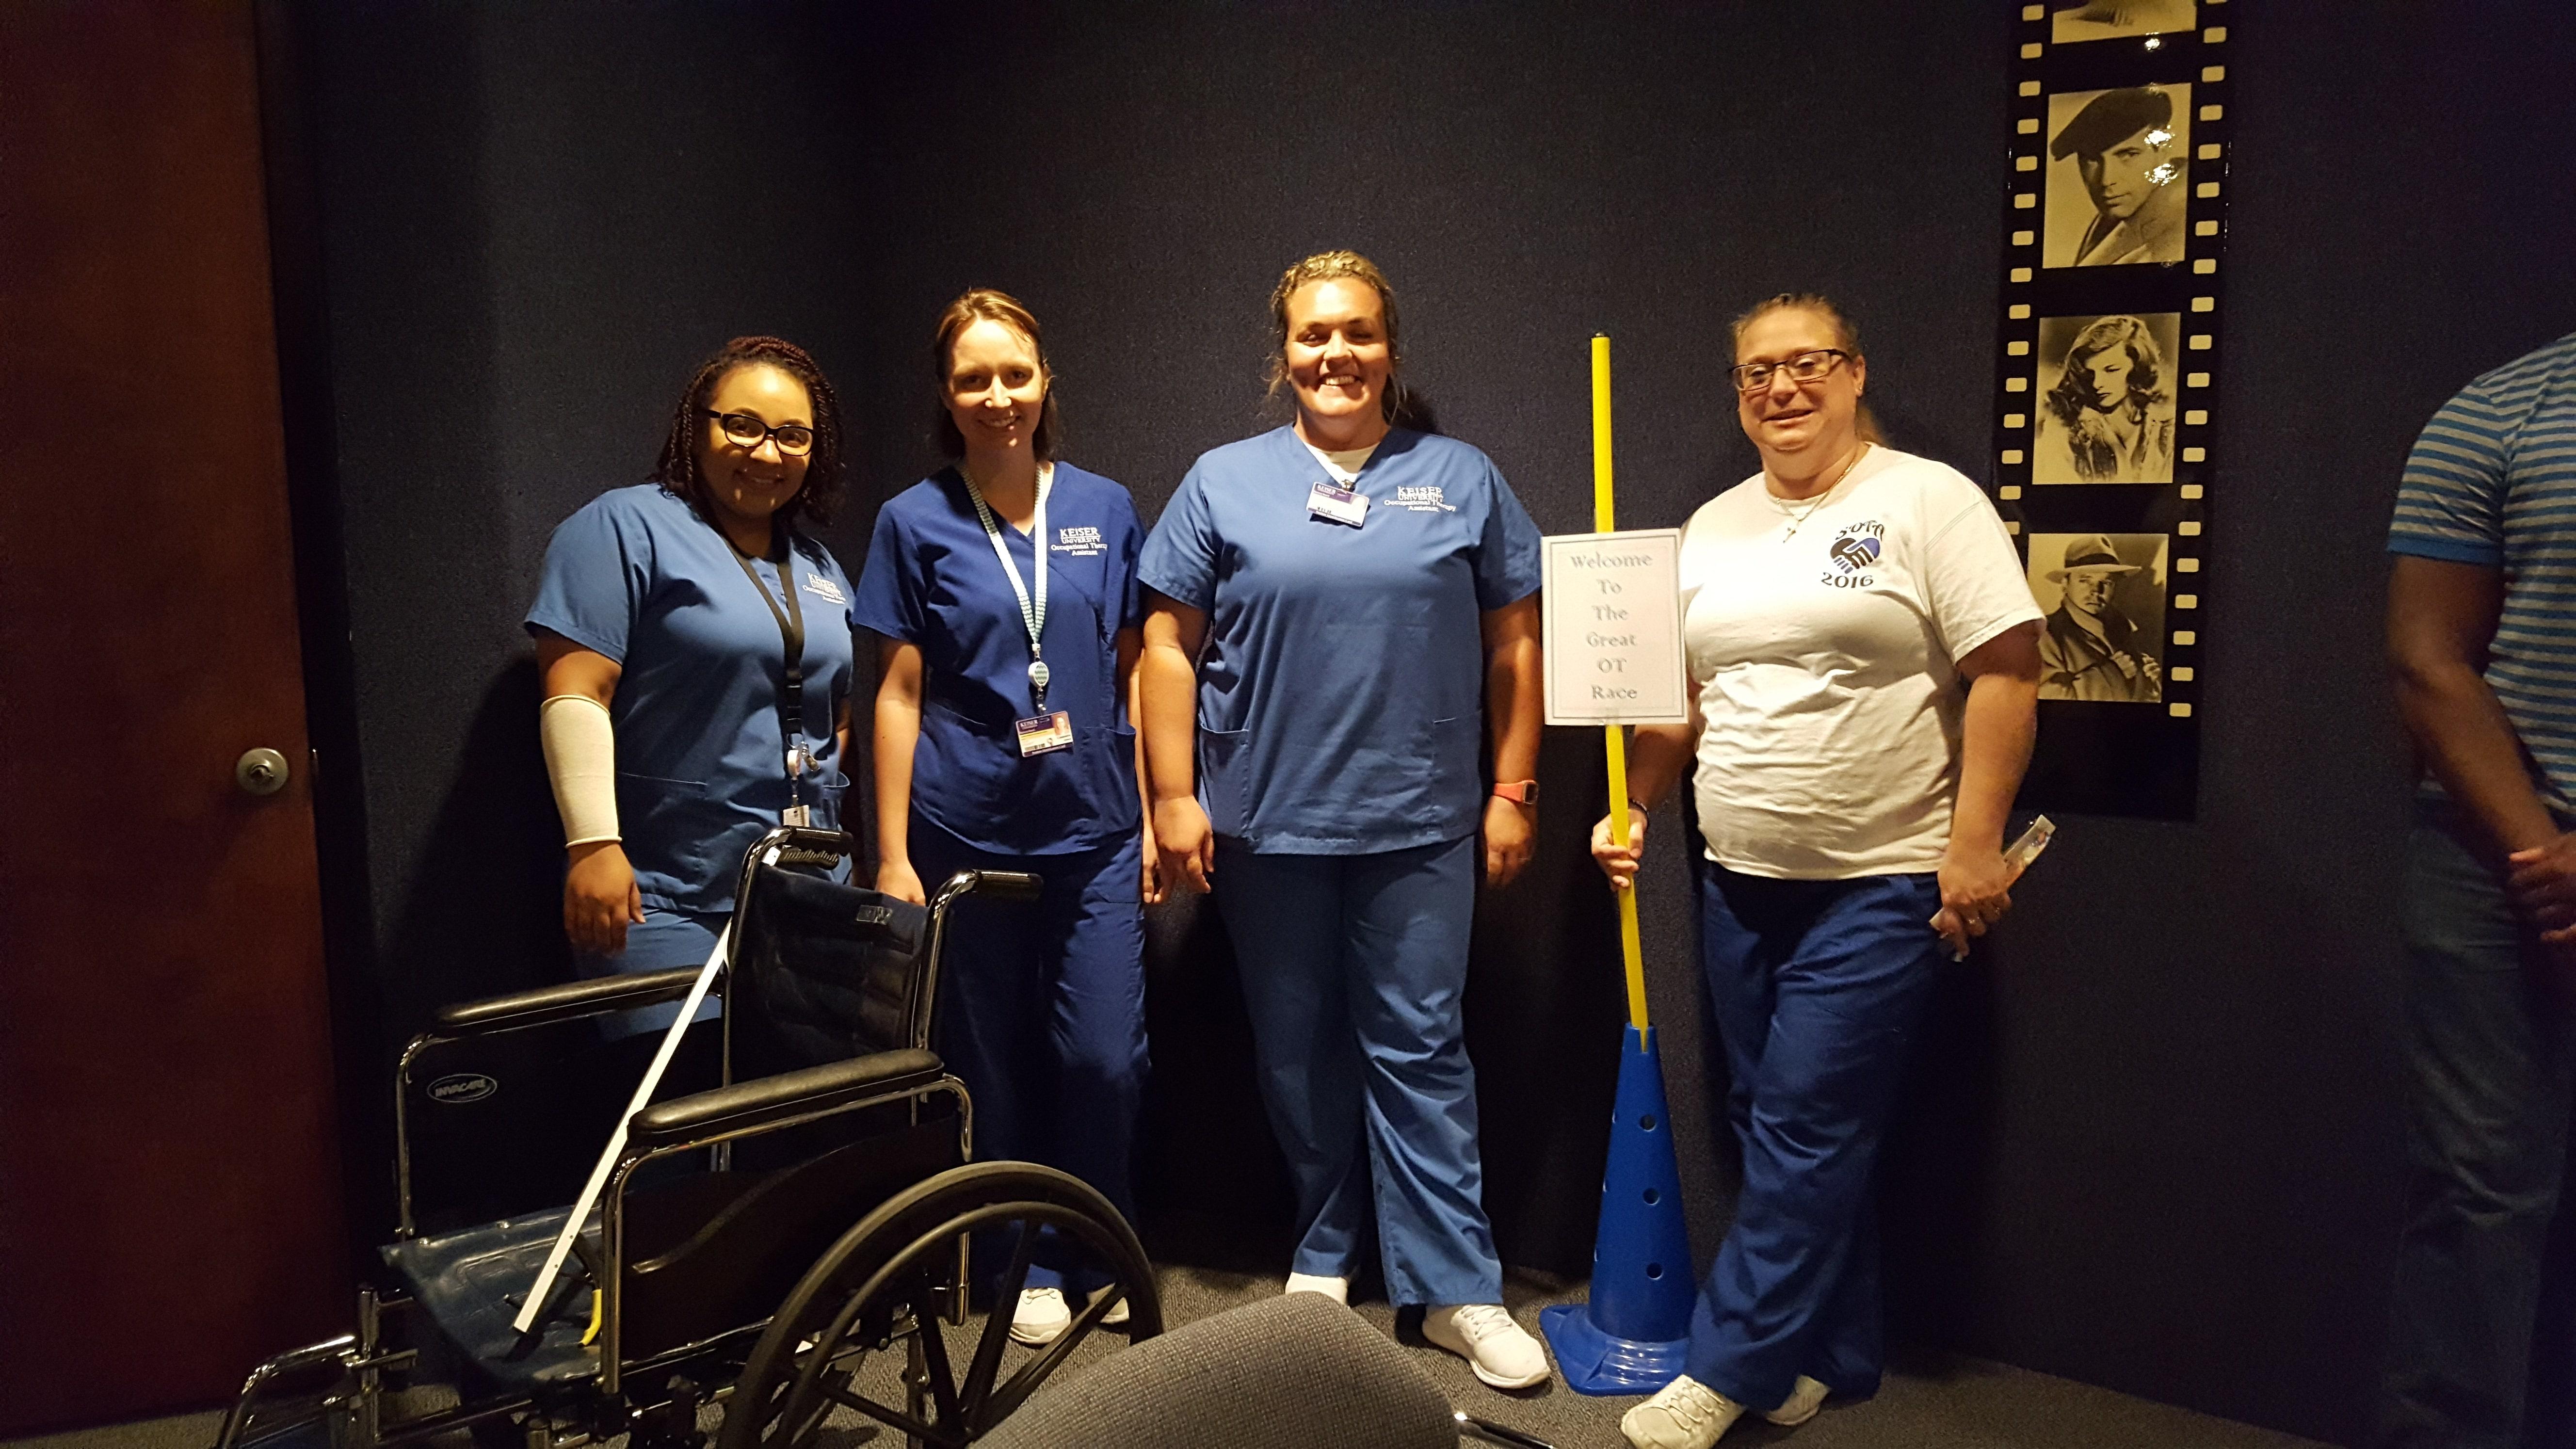 Daytona OTA Students Celebrate National Occupational Therapy Month